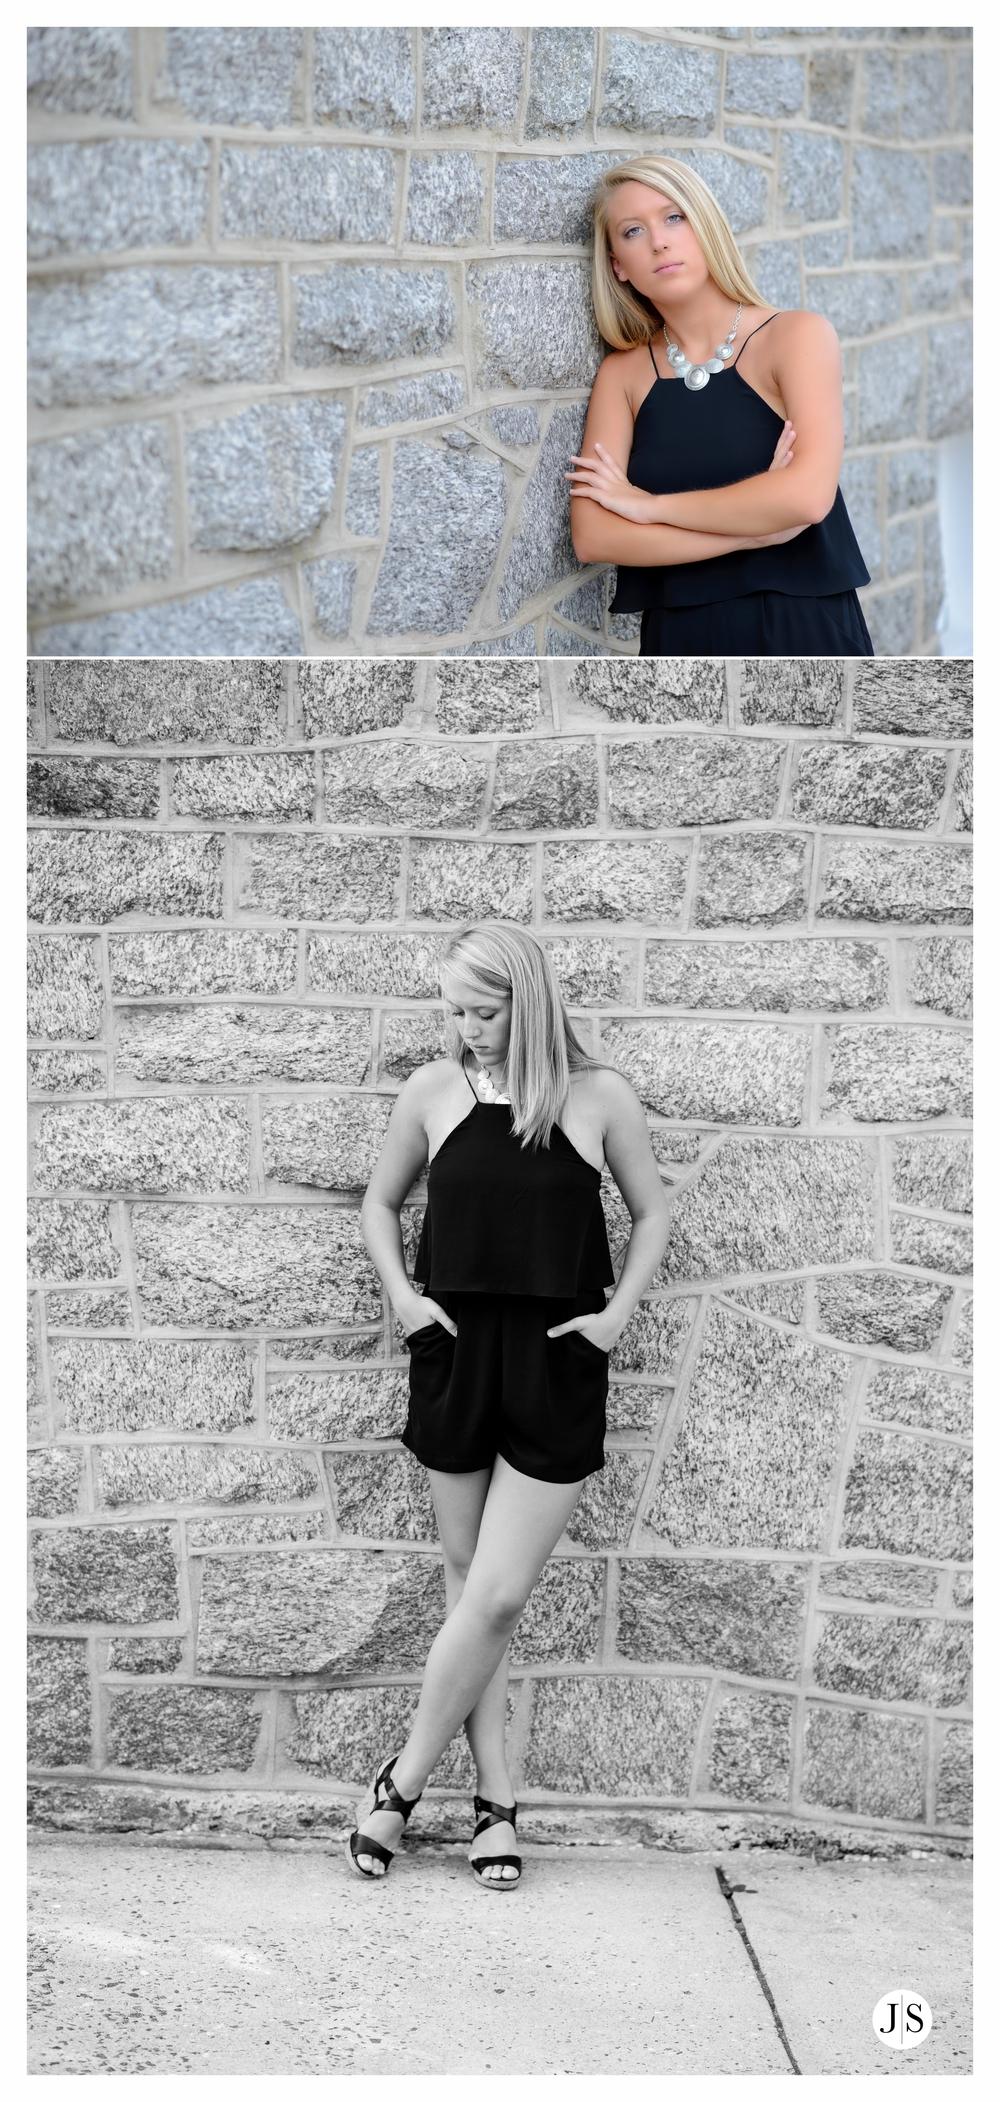 senior-portraits-berlin-maryland-downtown-photo-salisbury 5.jpg